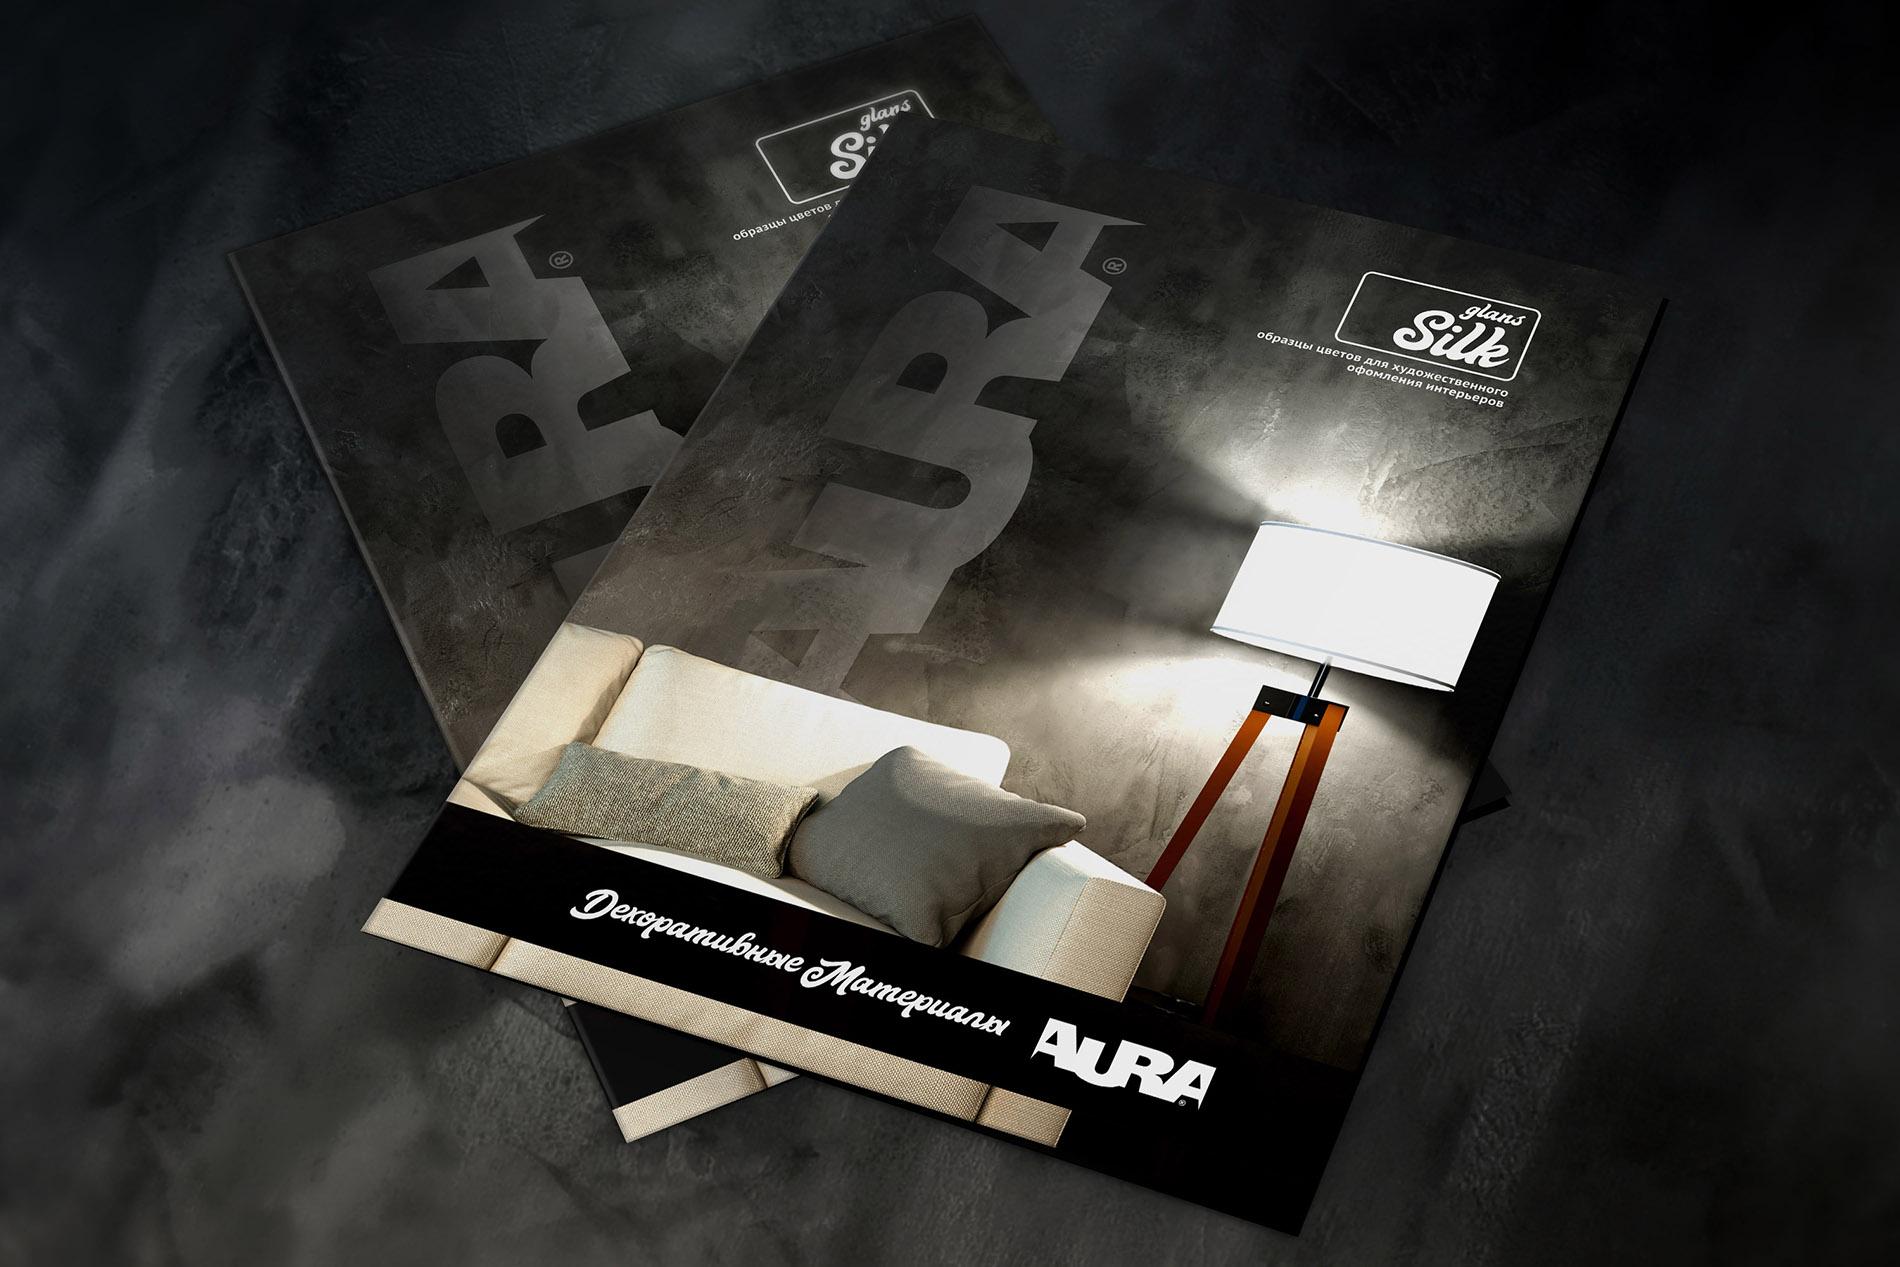 Aura. Decorative coatings